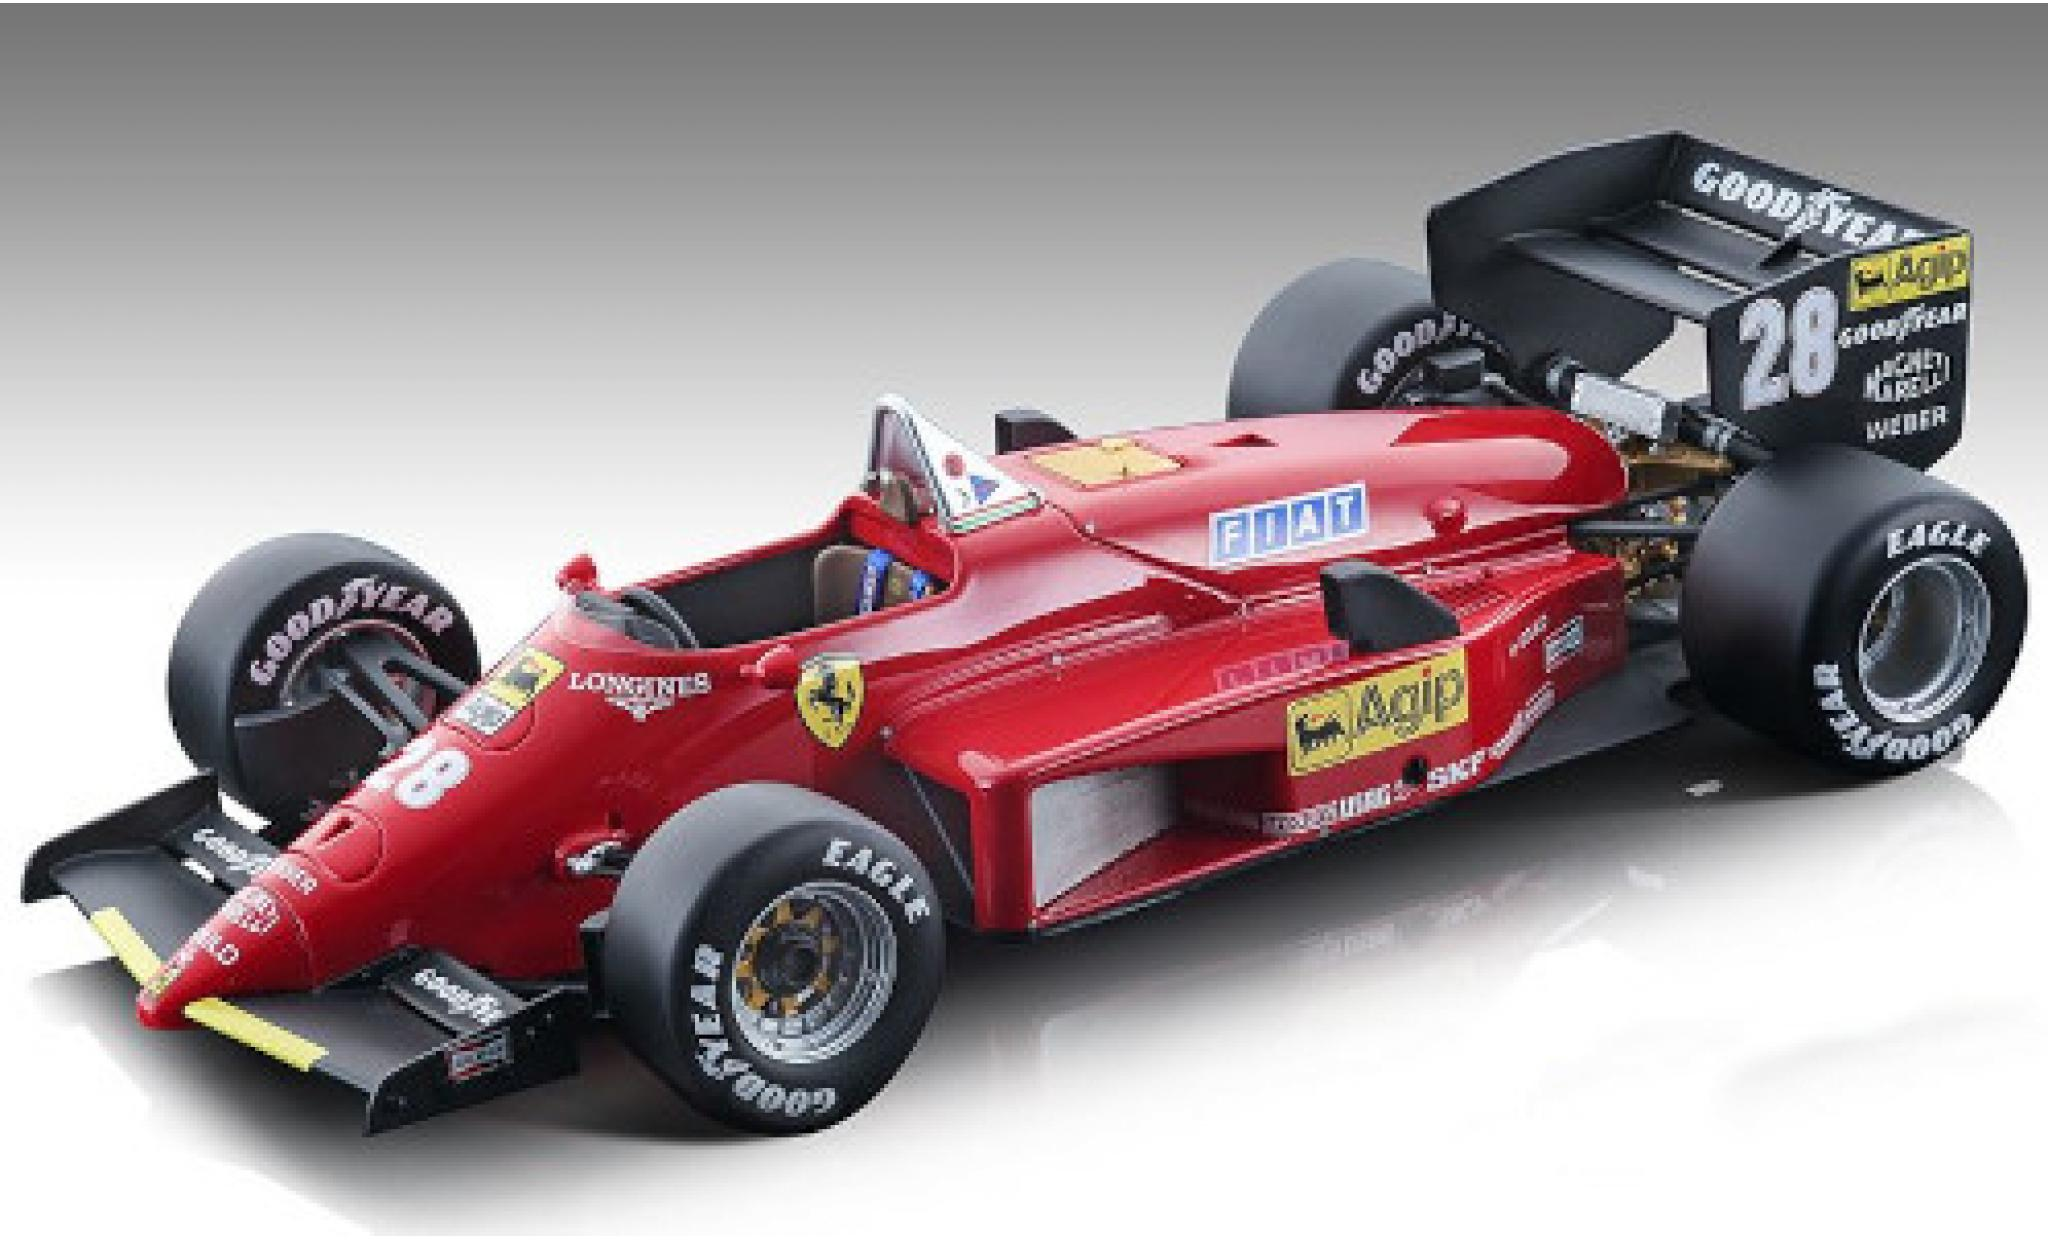 Ferrari 156 1/18 Tecnomodel -85 No.28 Scuderia Formel 1 GP Nürburgring 1985 y compris les Decals S.Johansson